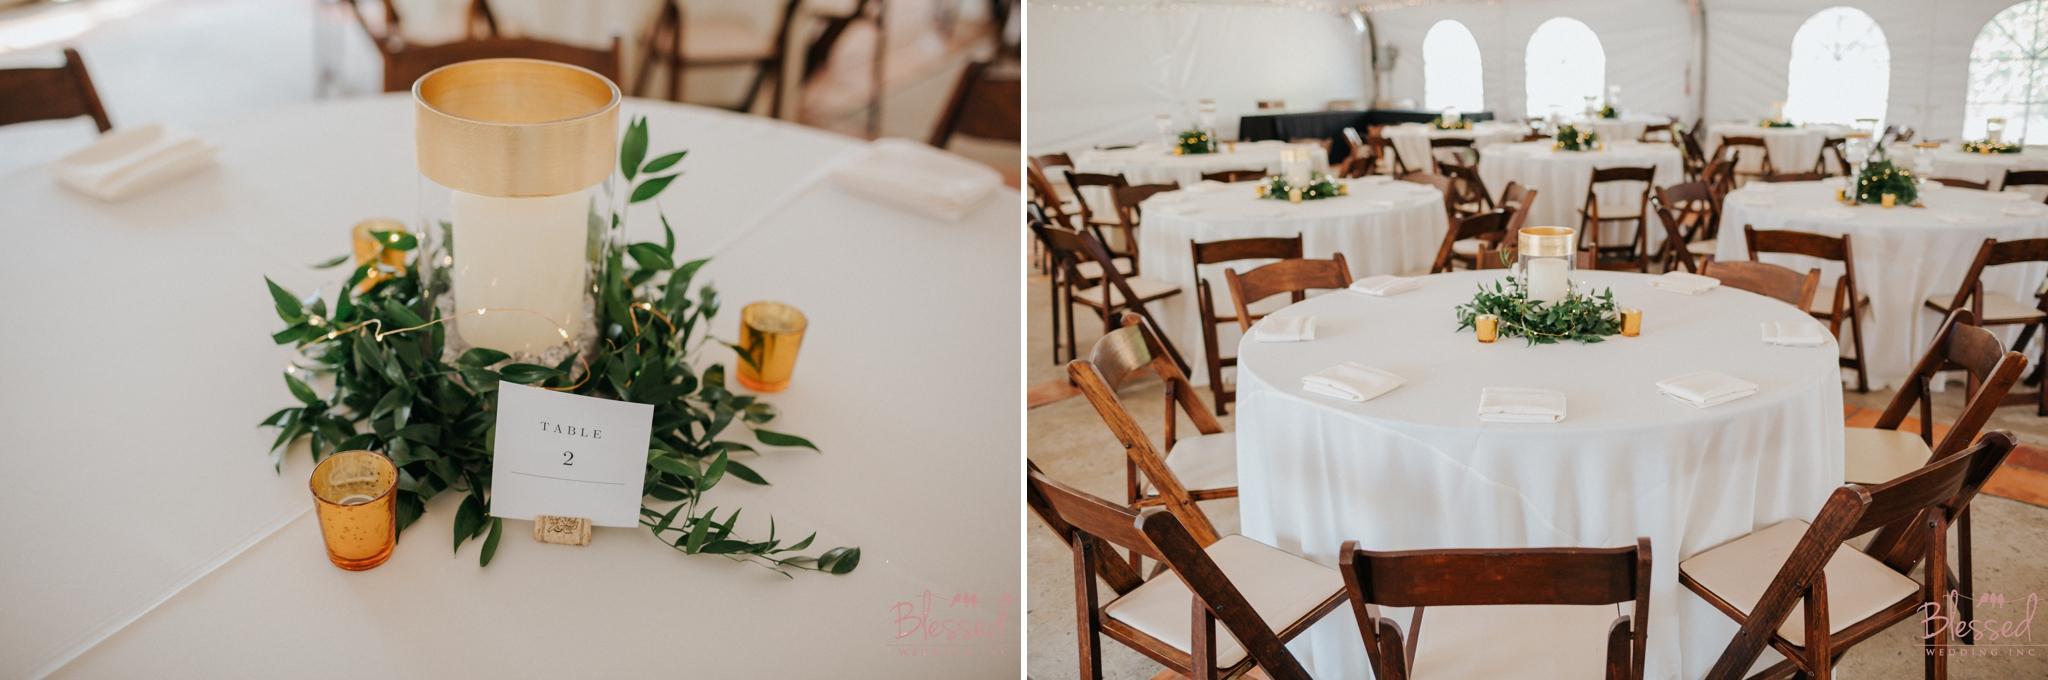 Orfila Vinery Wedding by Blessed Wedding Photography 34.jpg